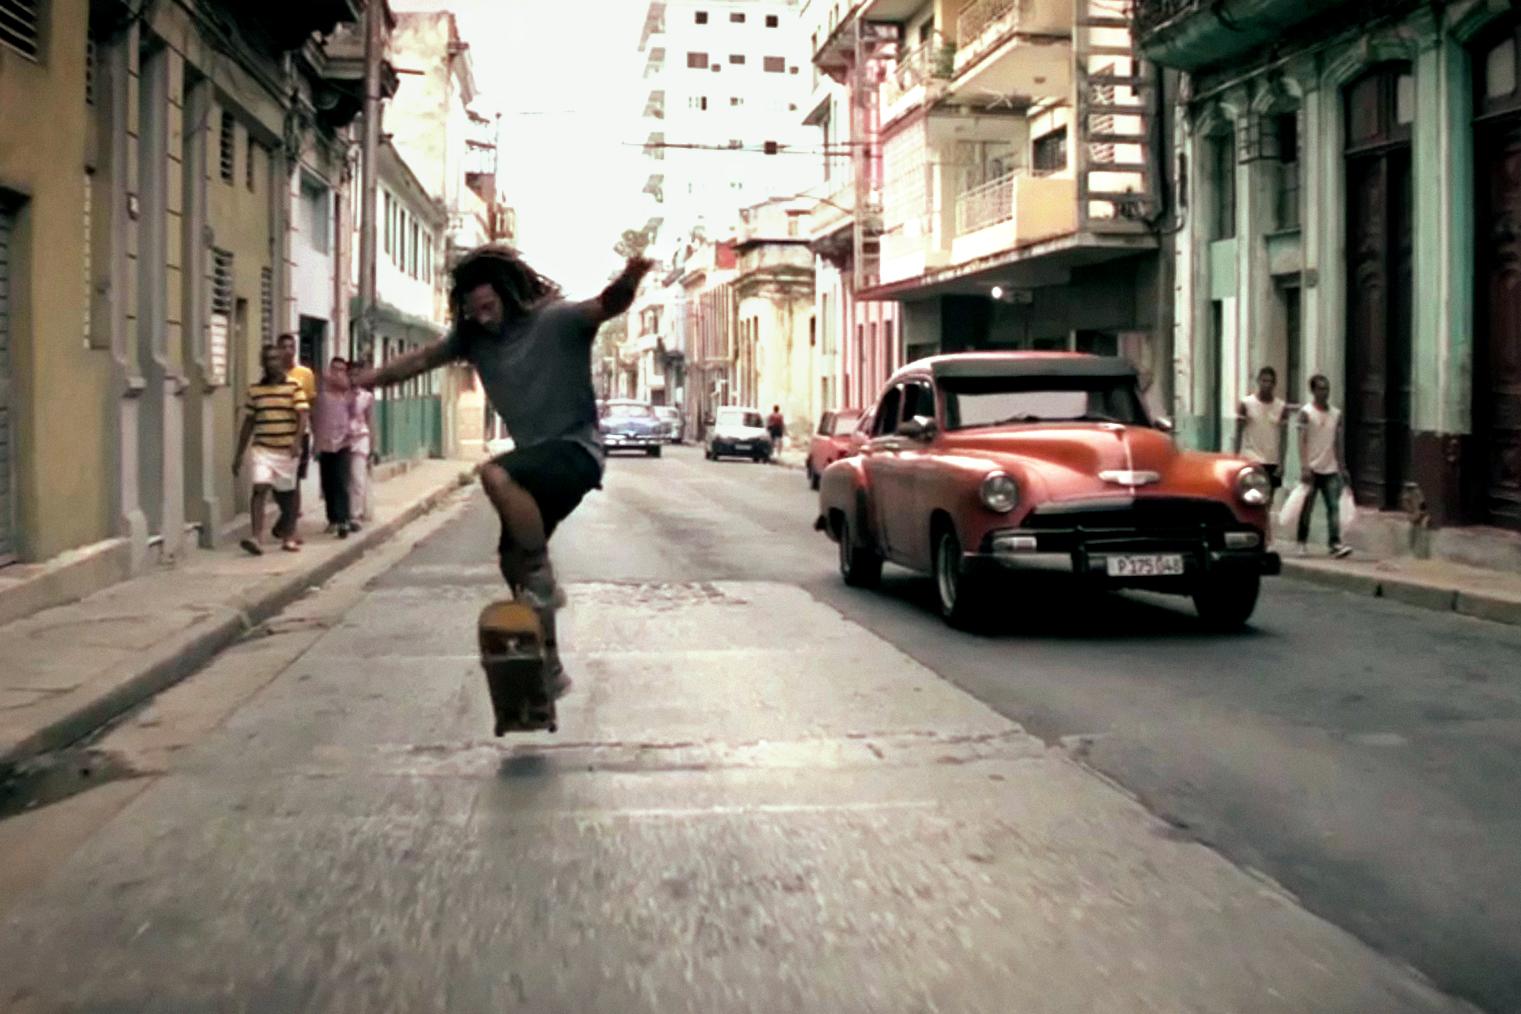 'El Ritual' by Ivan Olita Is a Short Film About Skating in Cuba